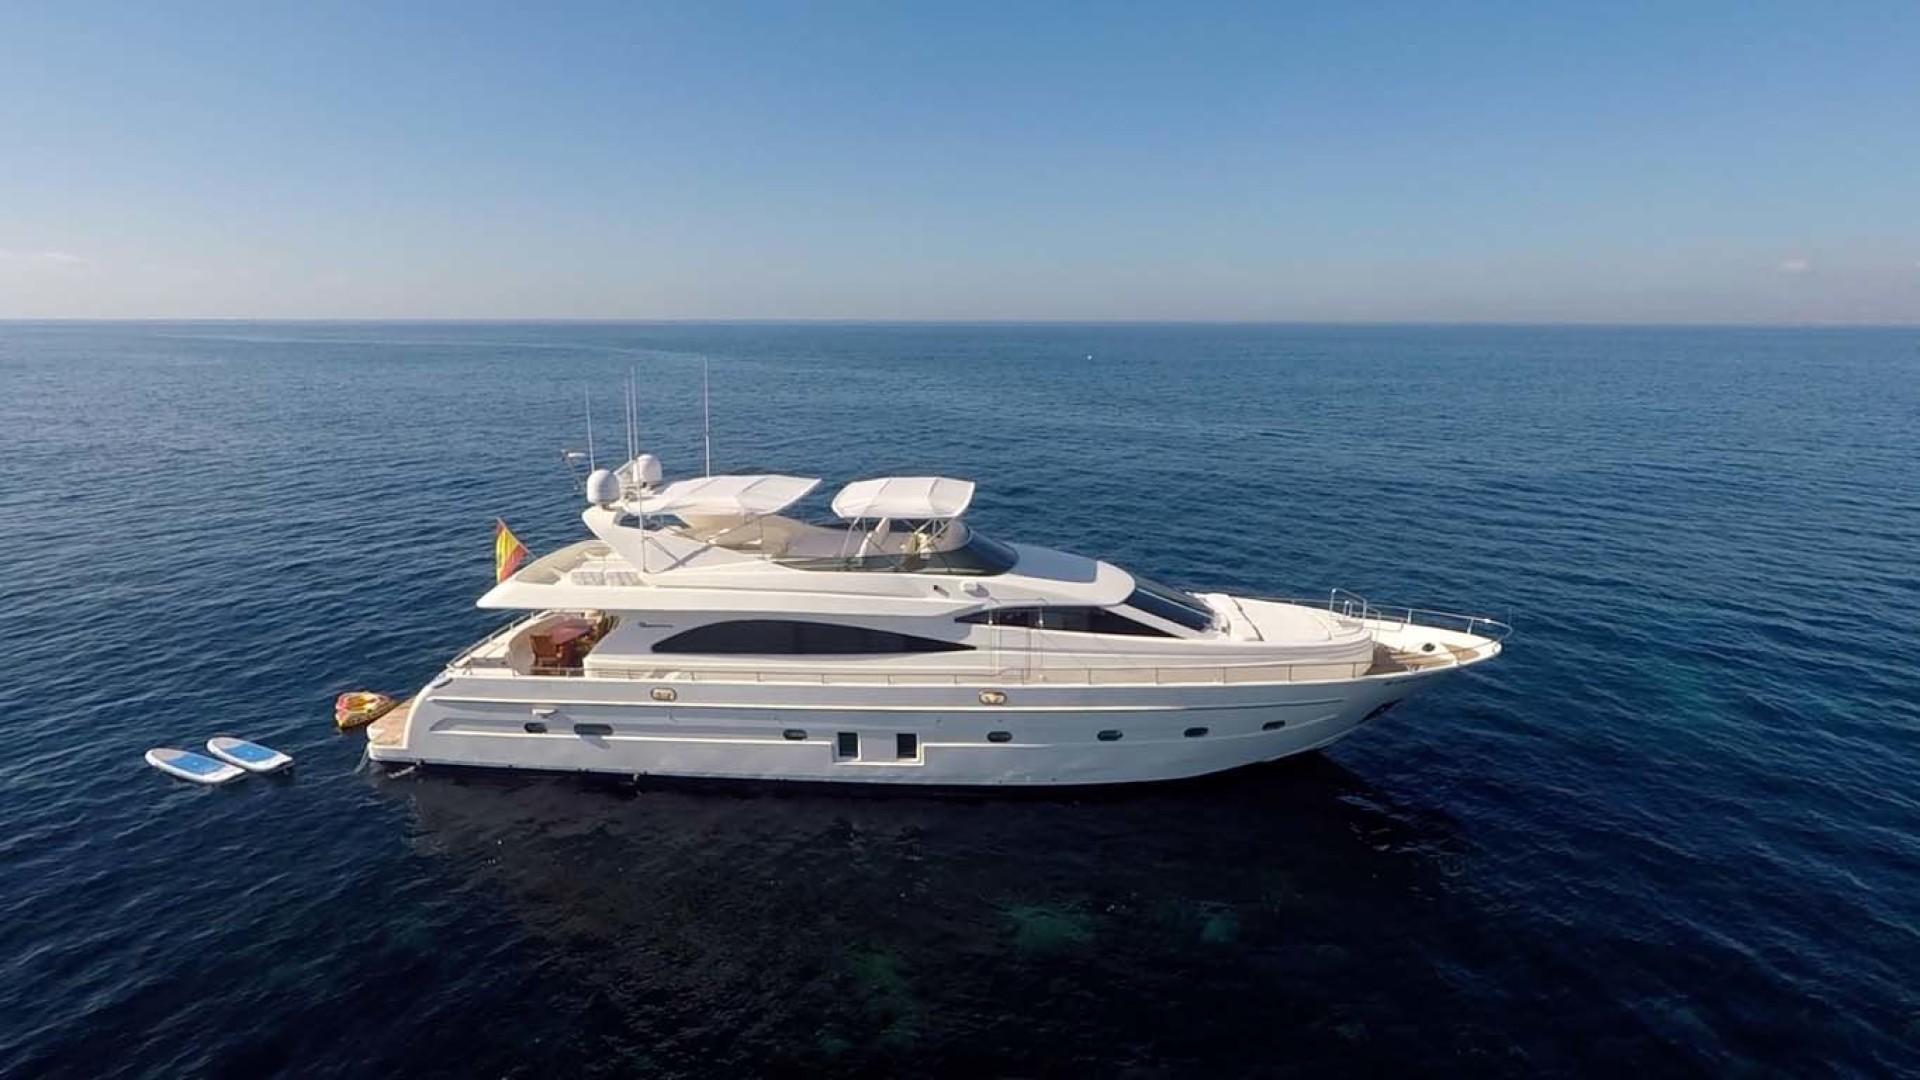 Astondoa-82 GLX 2006-Hemera Cuarta Ibiza-Spain-Starboard Side-1239820   Thumbnail